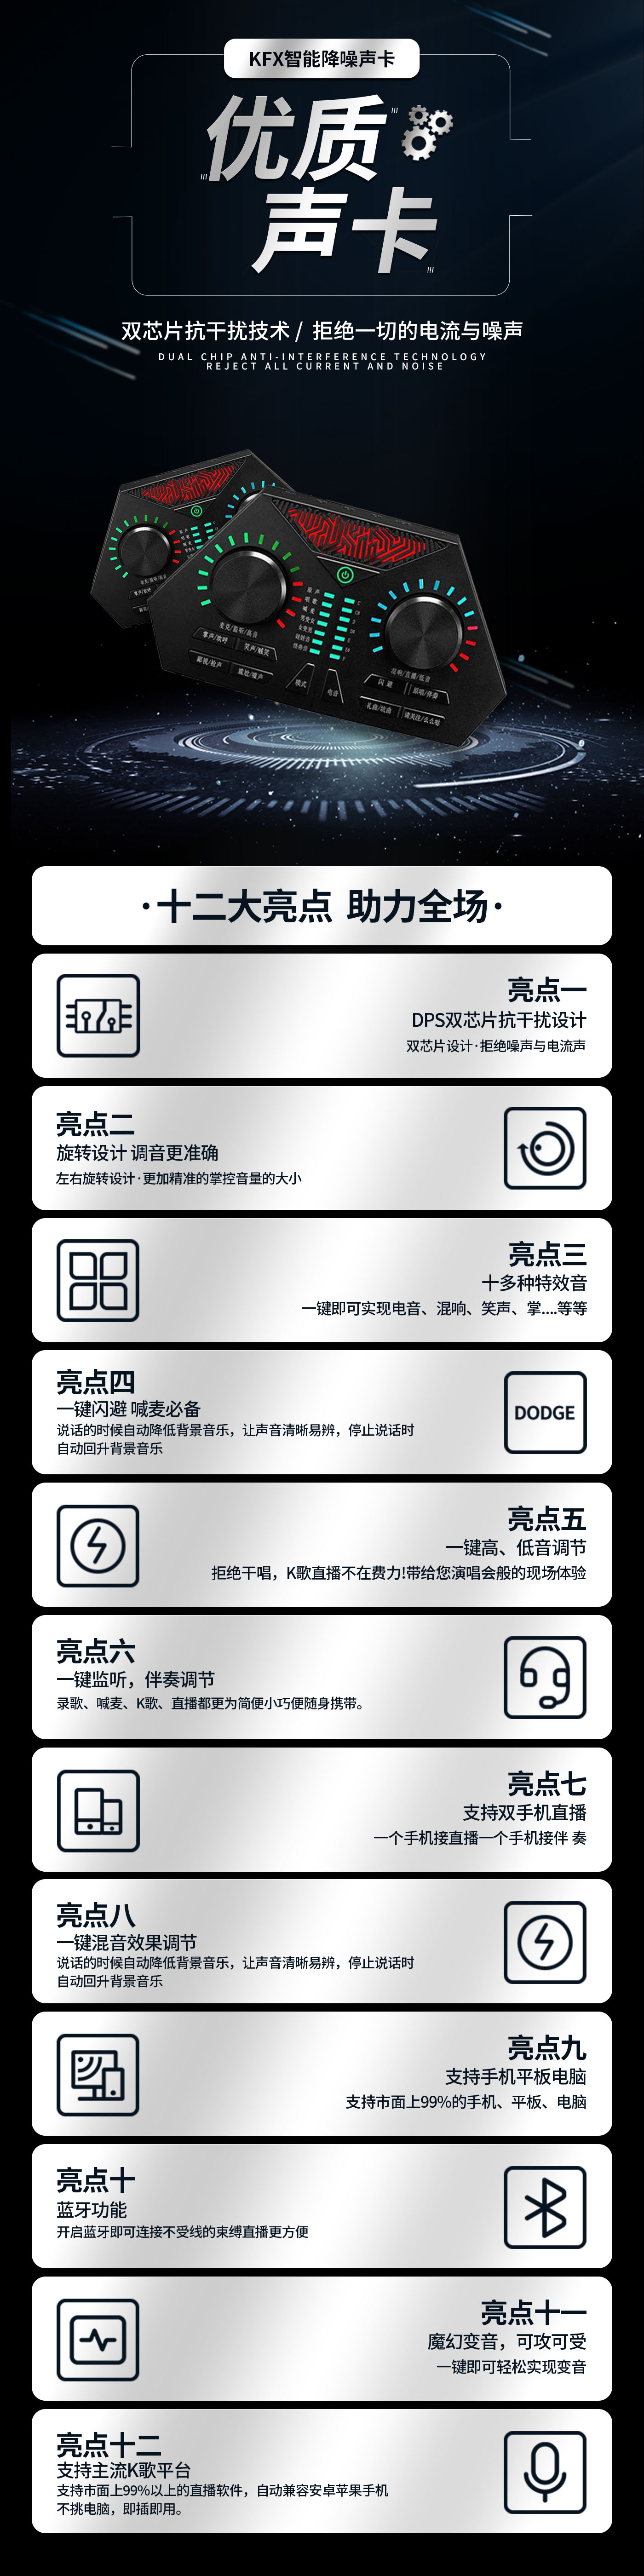 K-319新一代手机电脑直播声卡